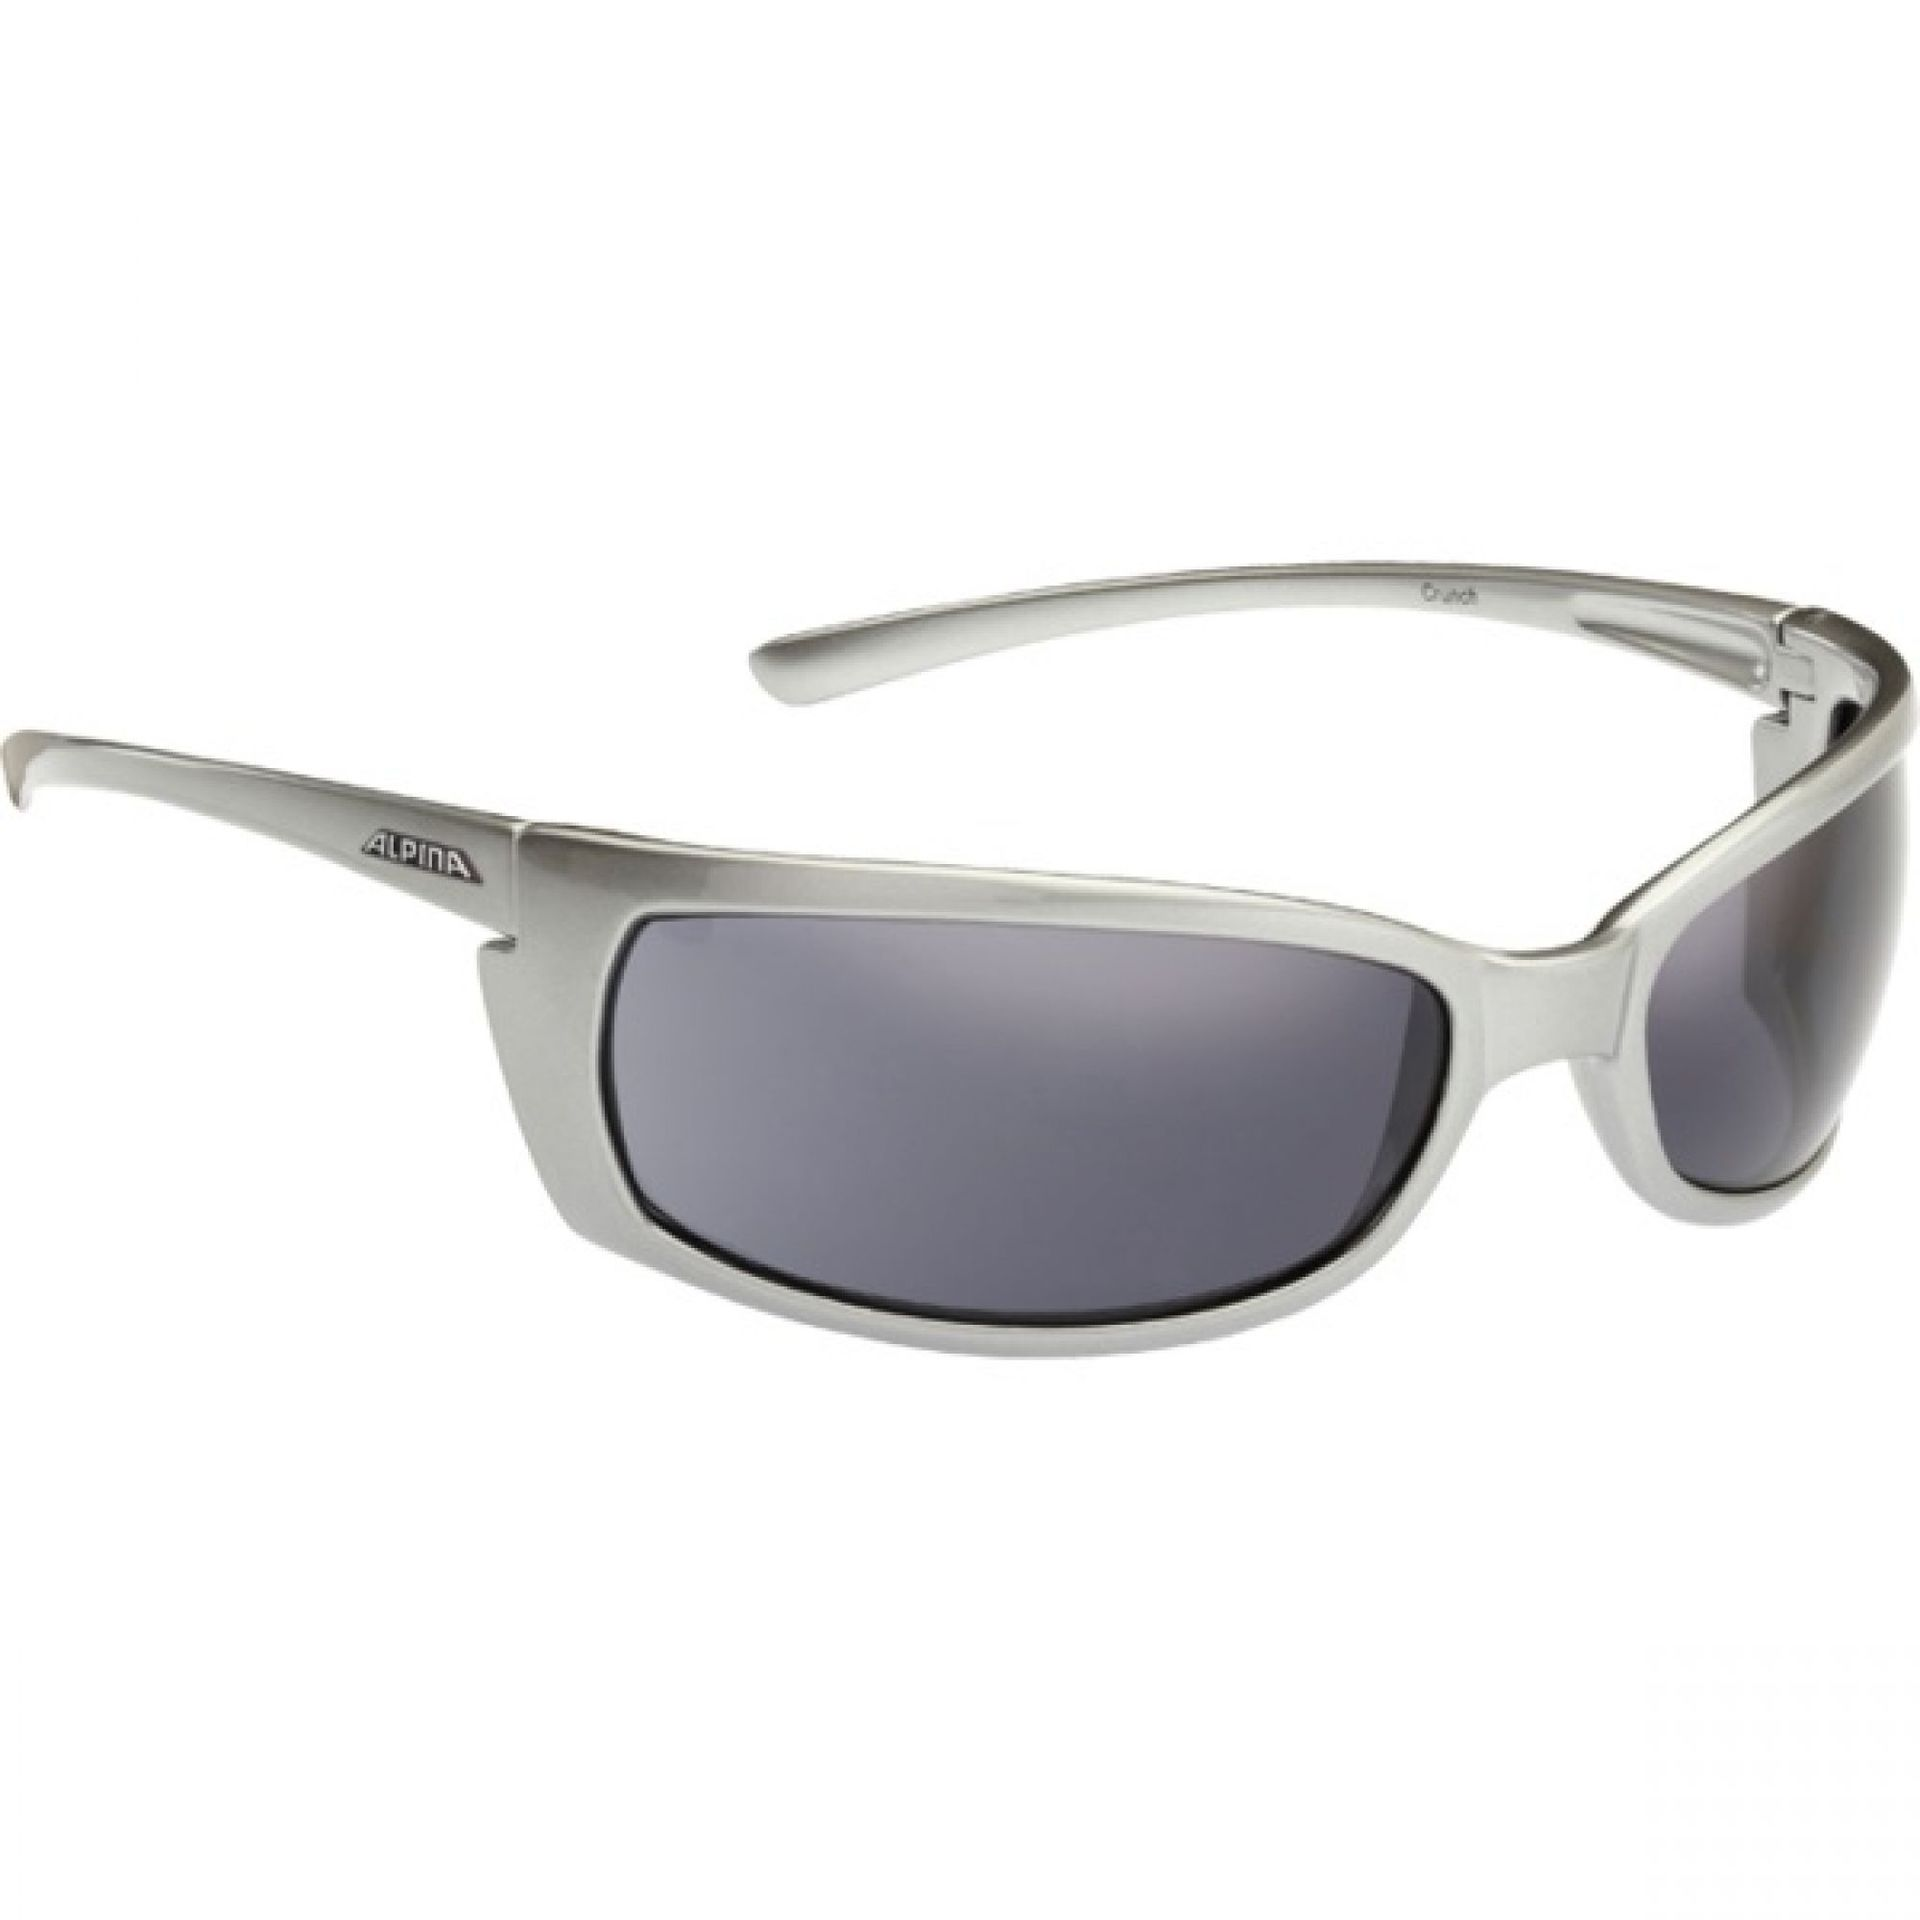 Okulary Alpina Crunch szaro czarne